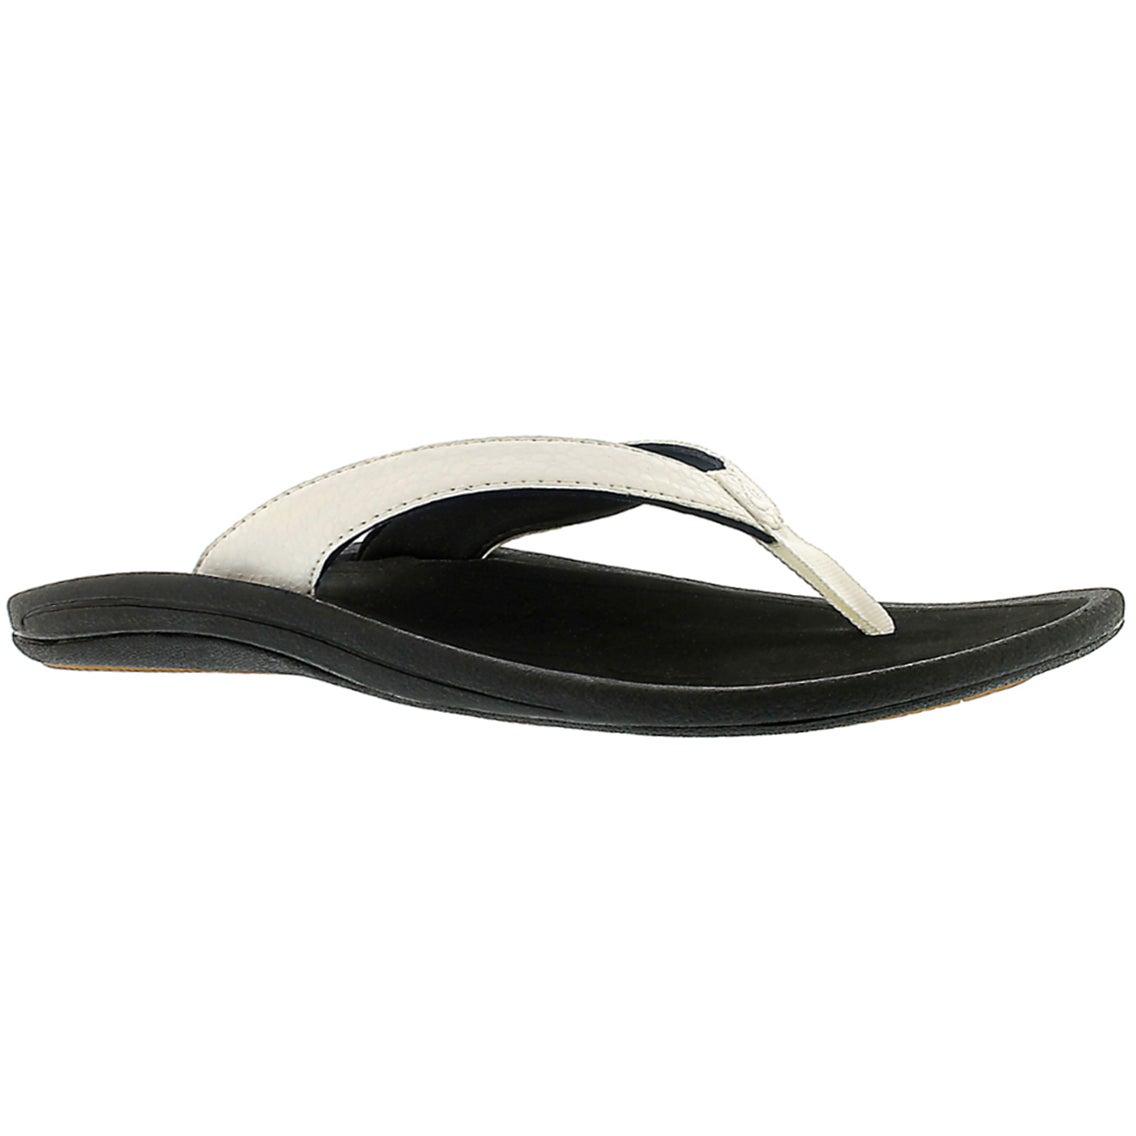 Sandales tongs KulapaKai, noir/blnc, fem